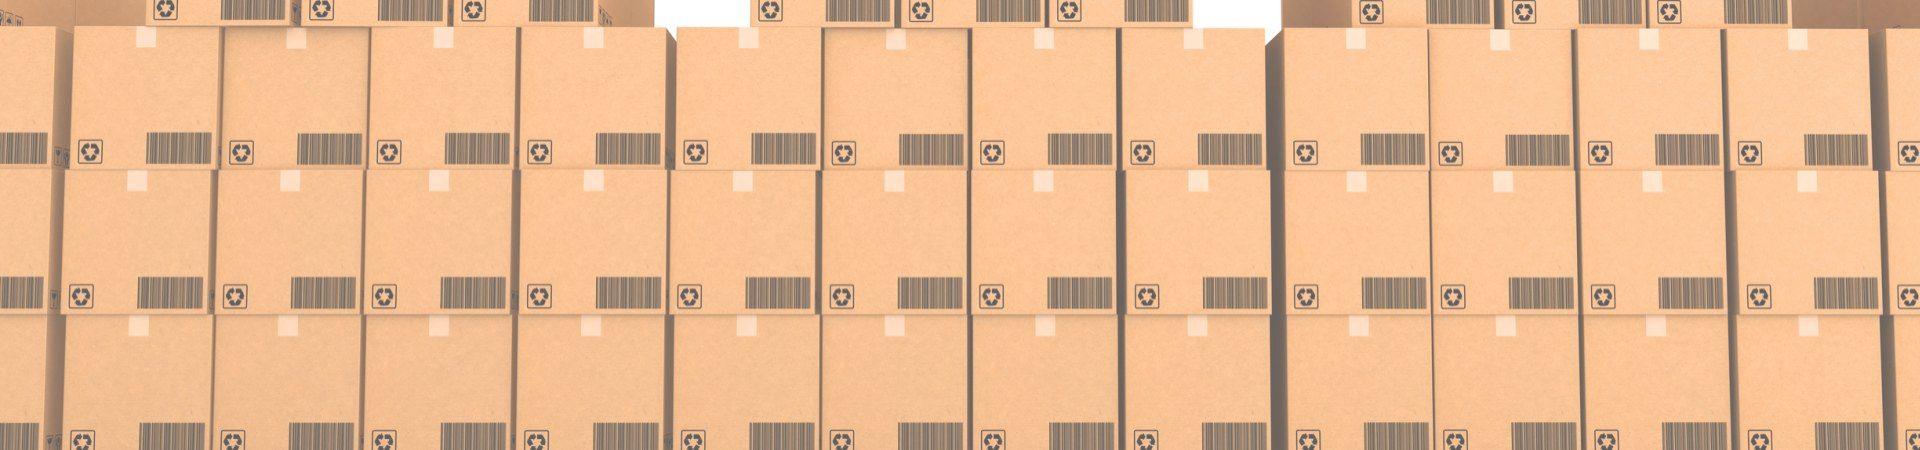 cargoboxes1920x450.jpg